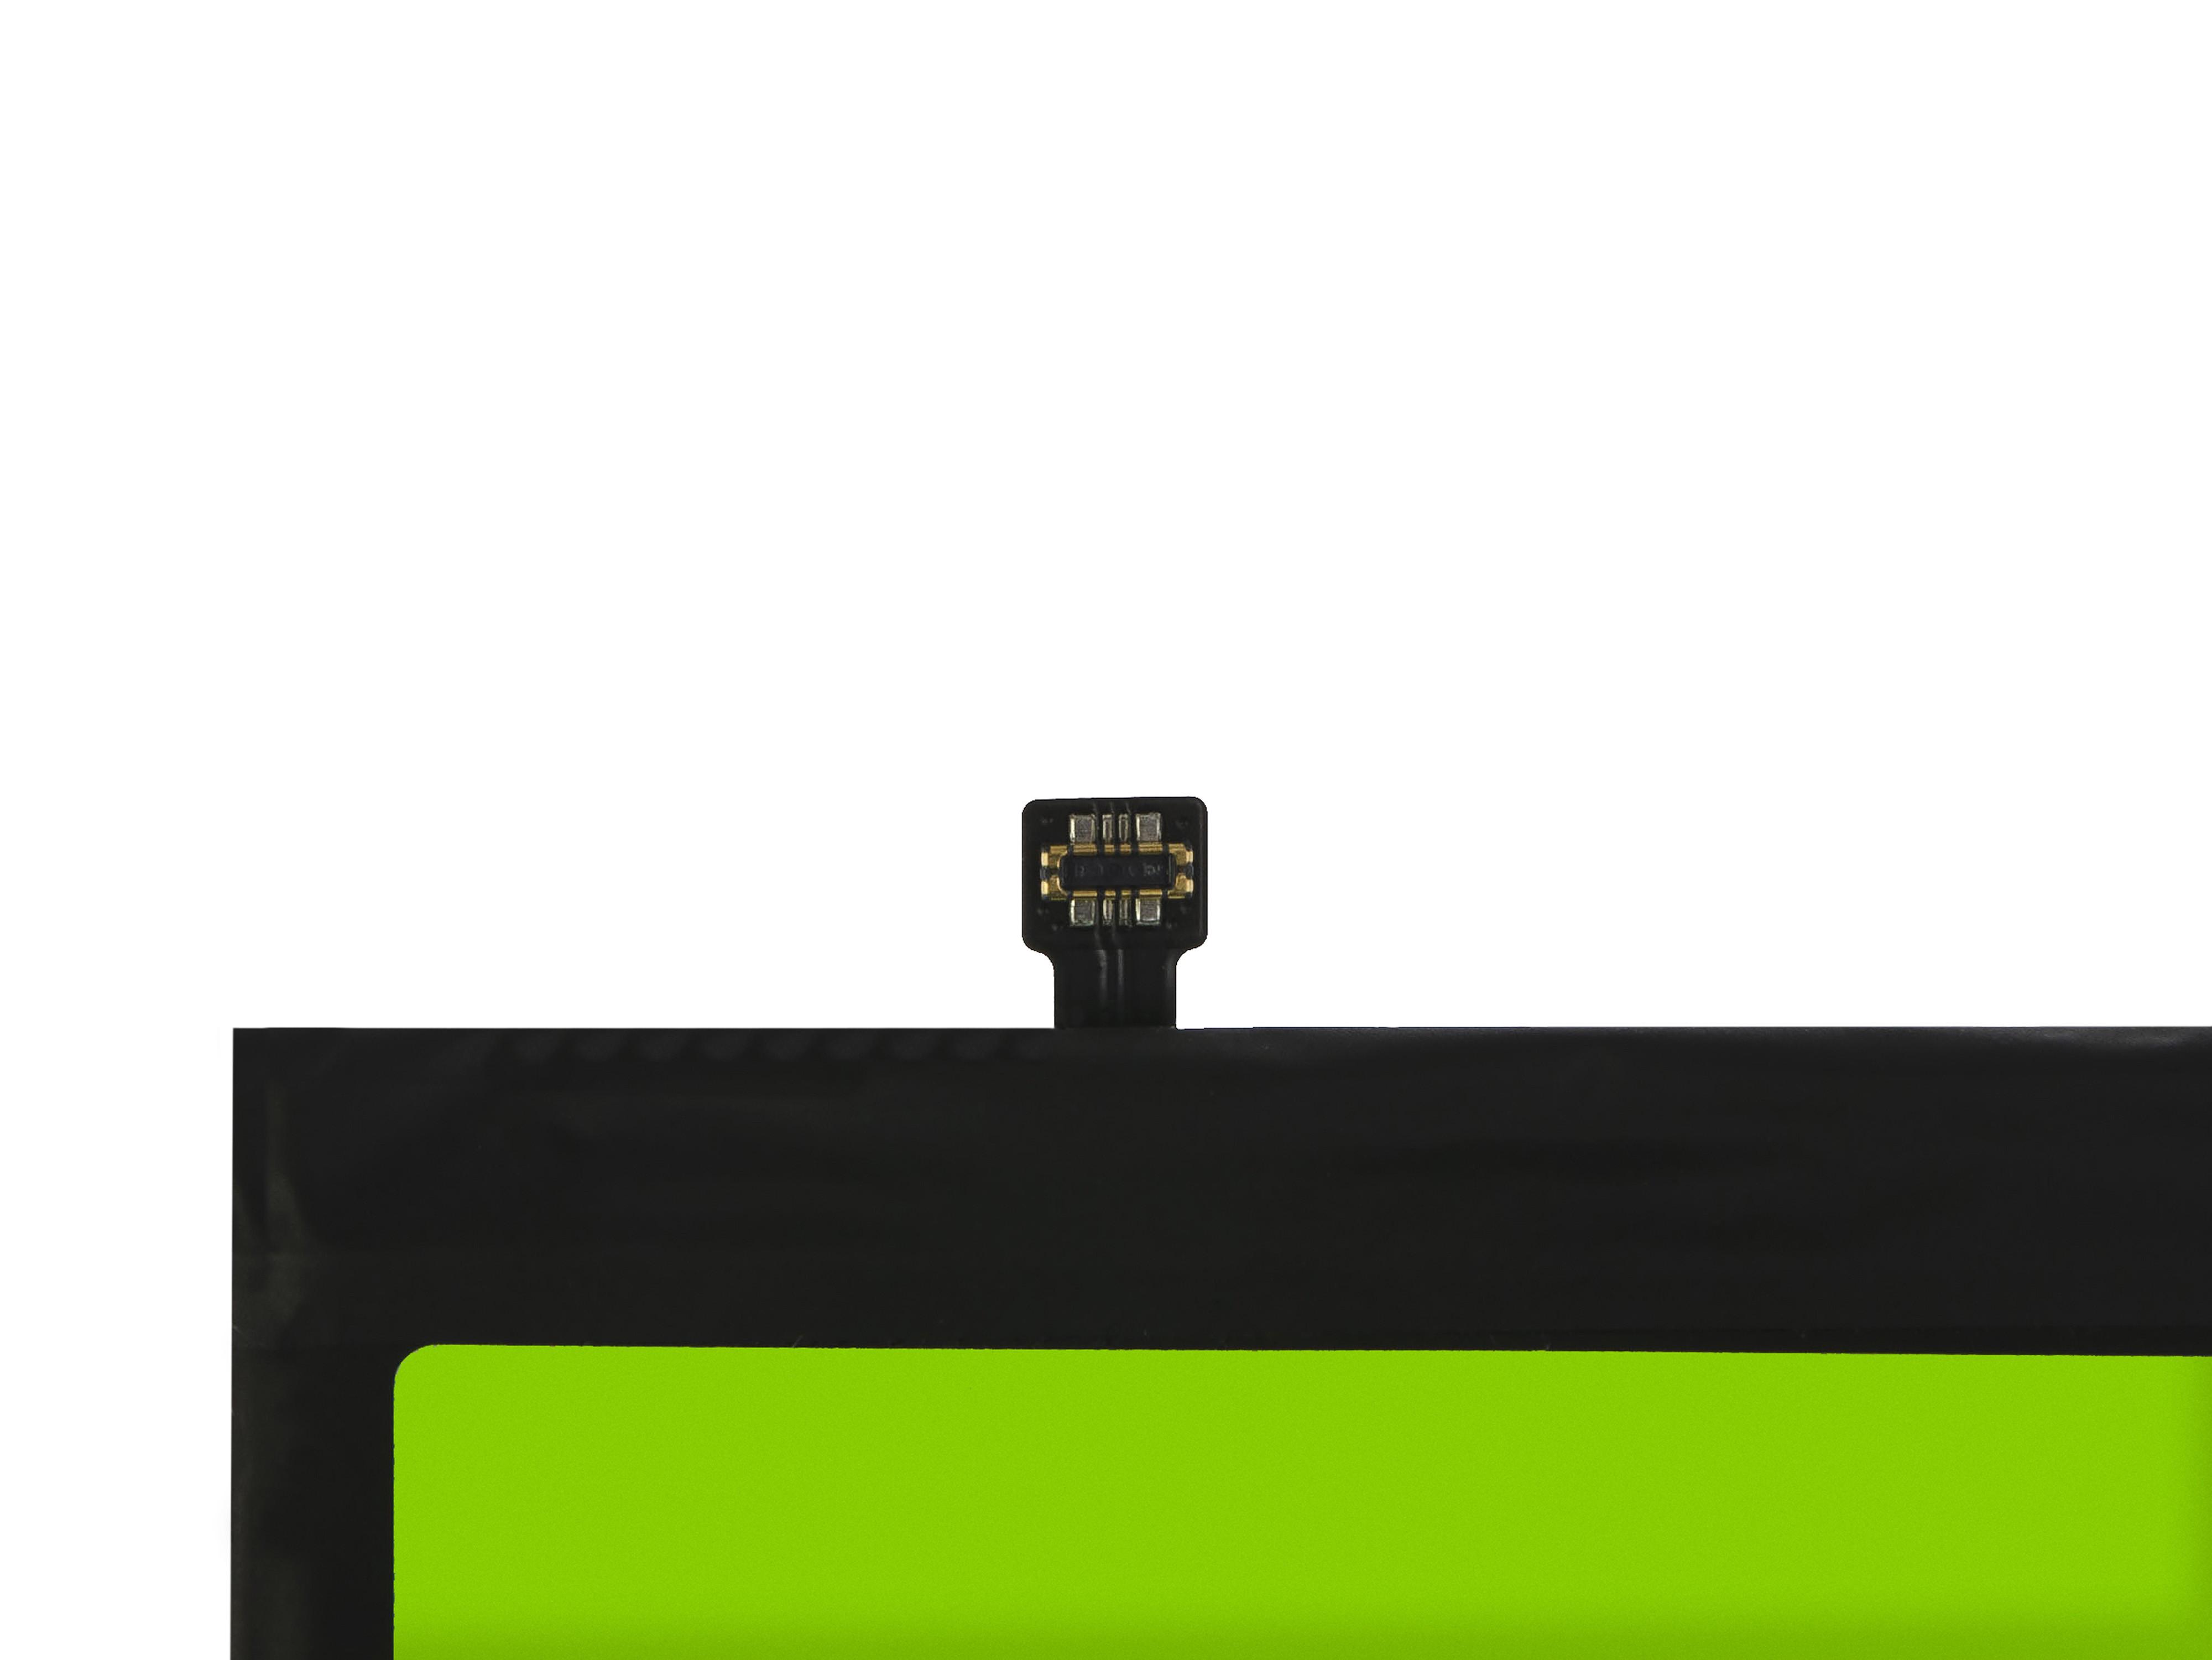 Batteri BN46 för Xiaomi Redmi 7 / Redmi Note 3